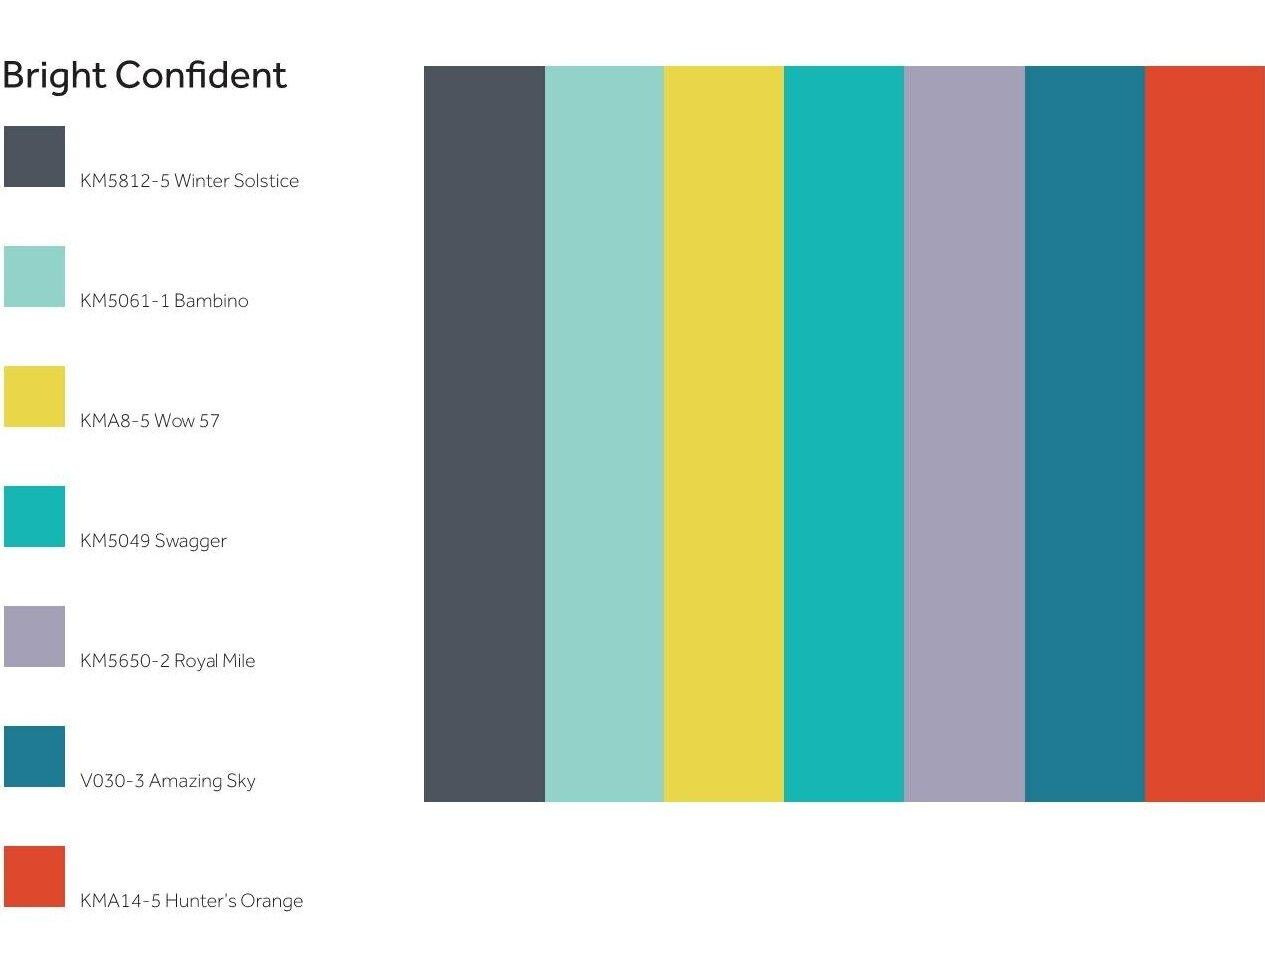 project+color+corps_madison+park+academy_bright+confident+palette.jpg